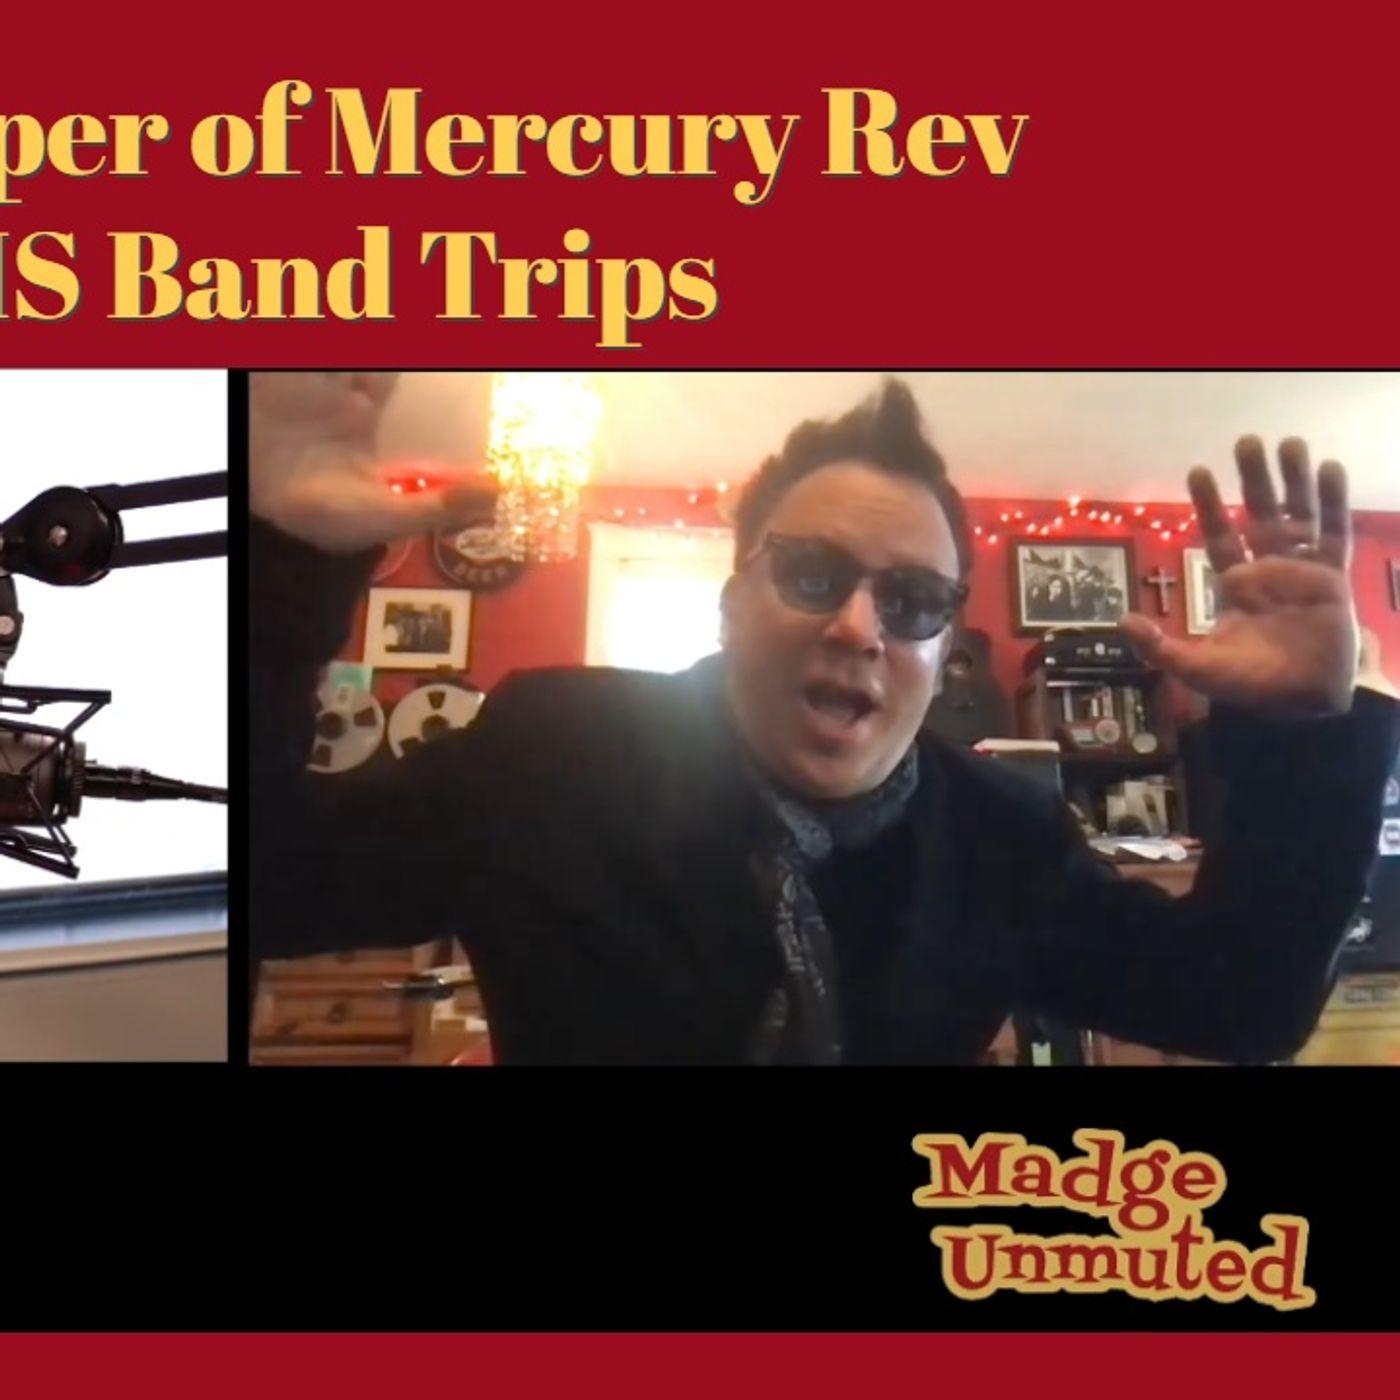 Grasshopper (Sean Mackowiak) of Mercury Rev on Delinquent HS Band Trips